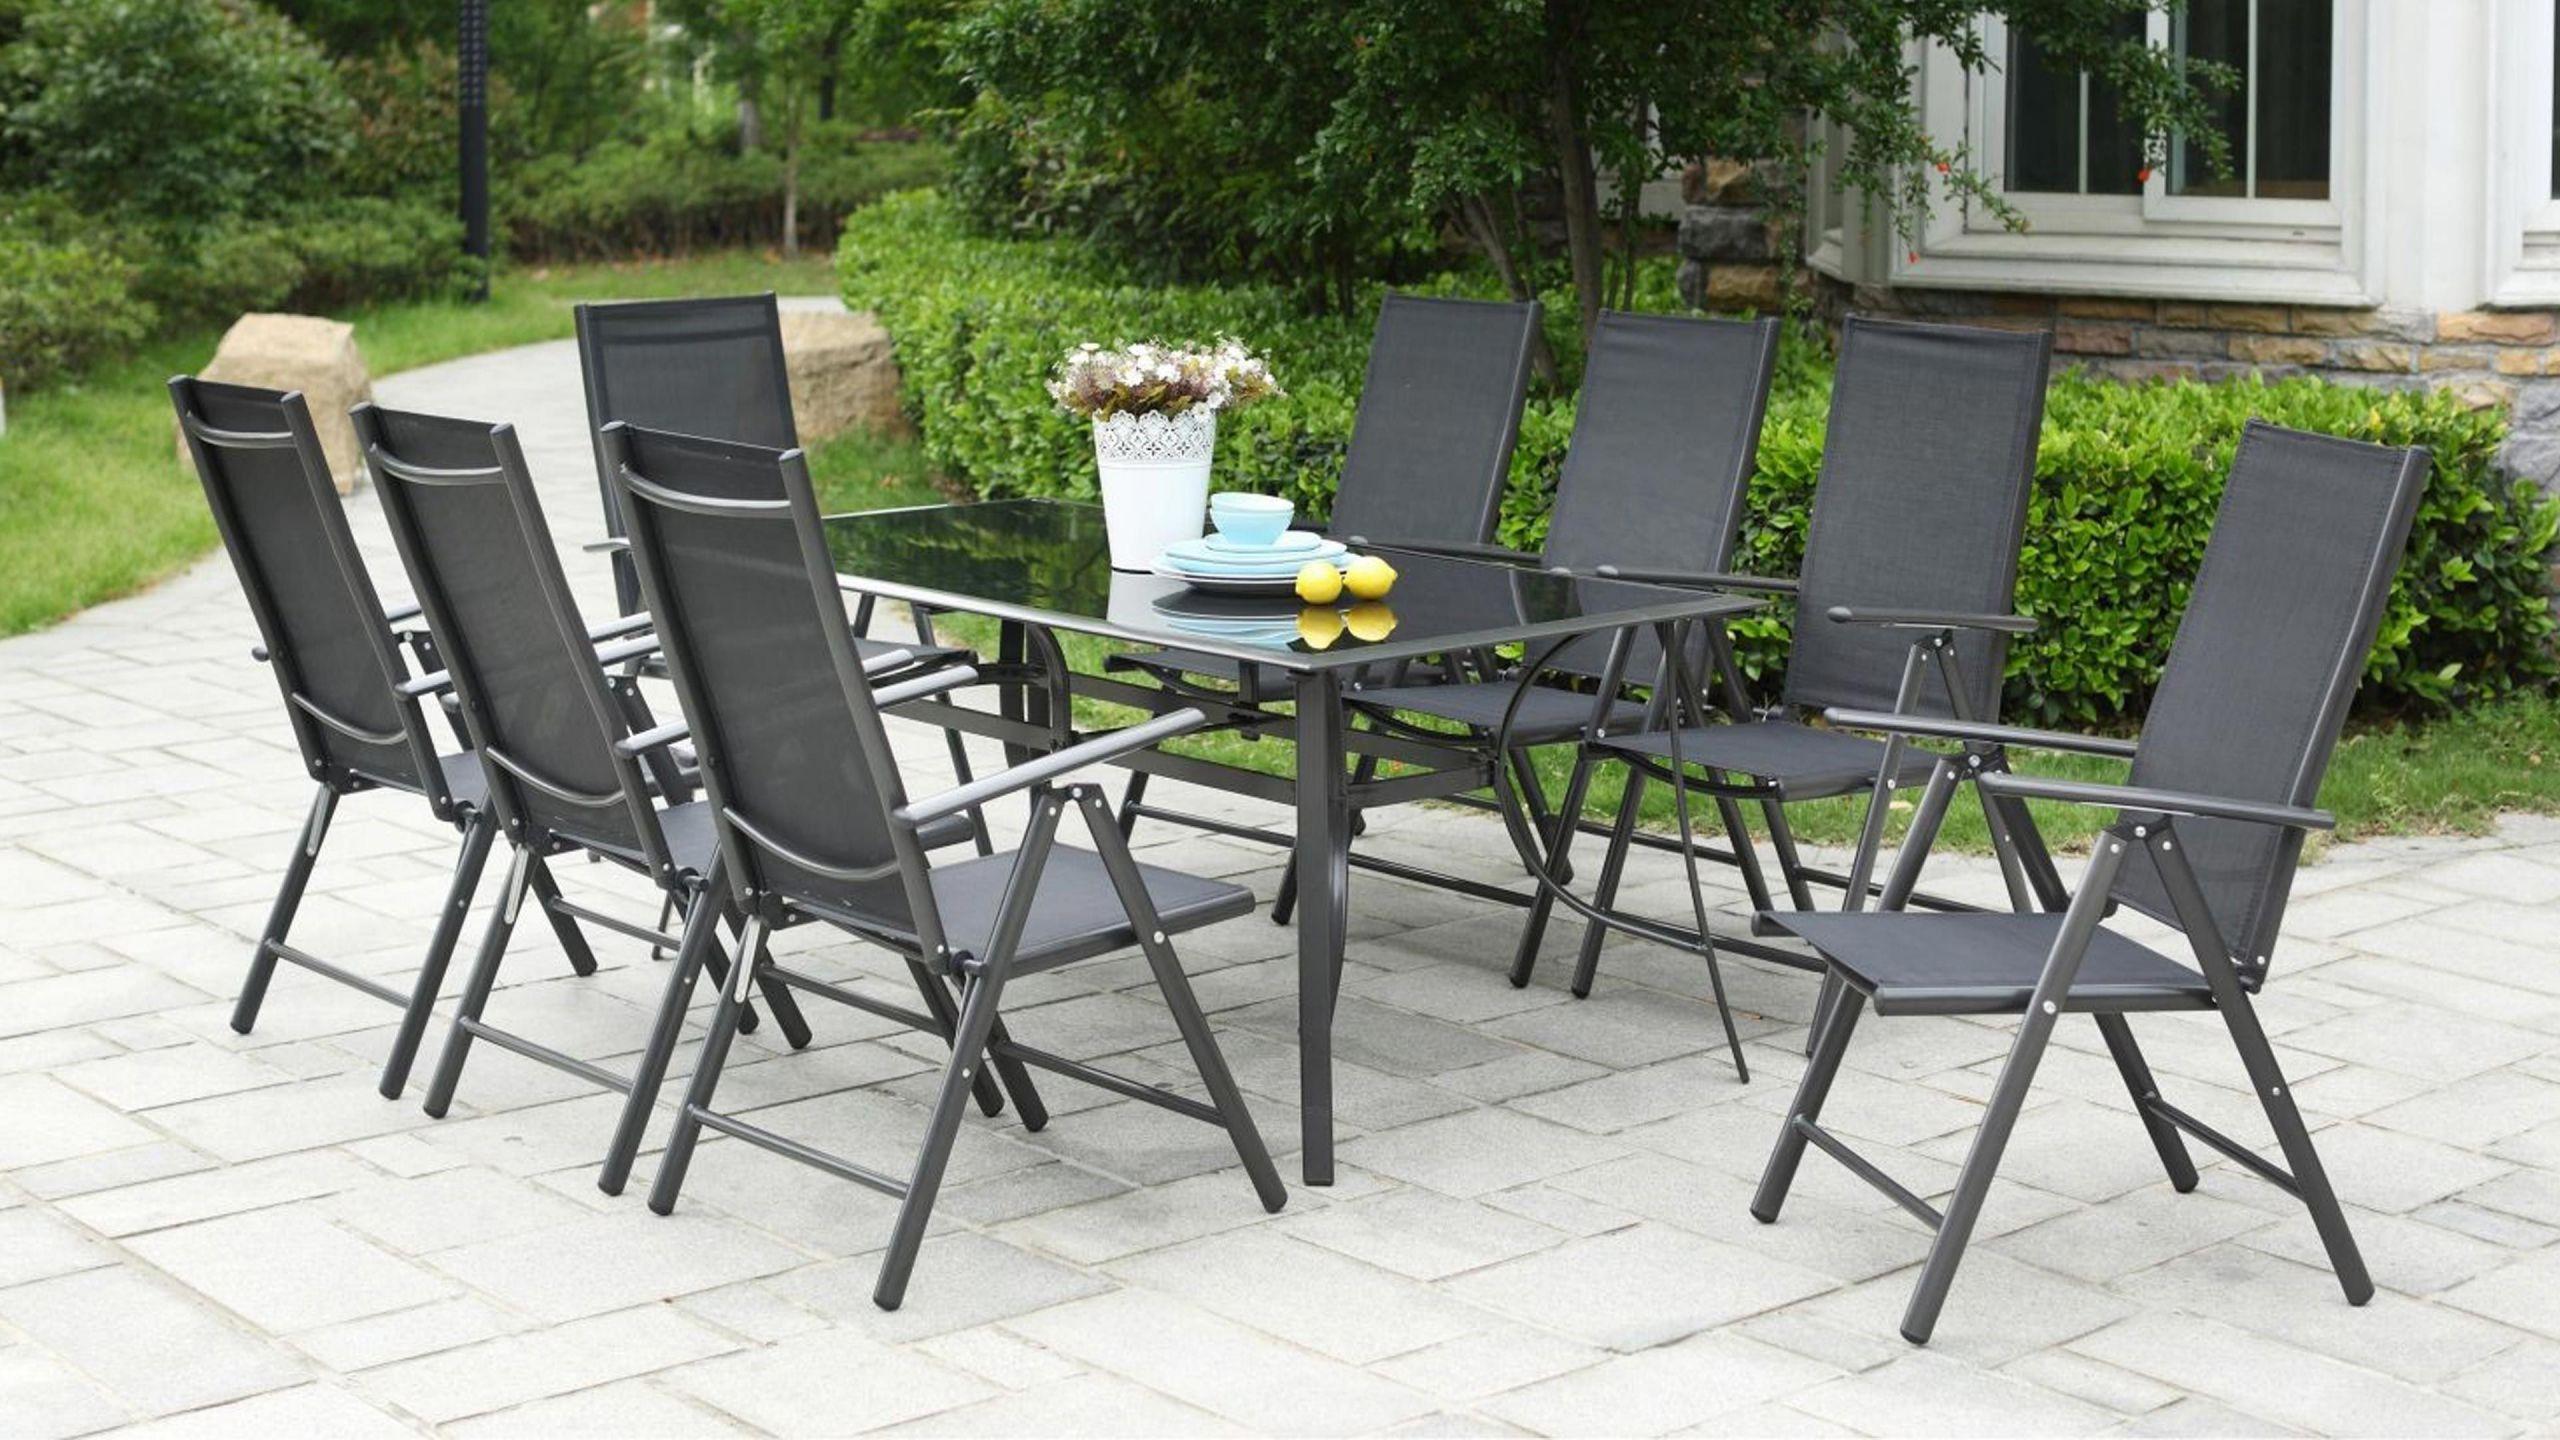 Table De Jardin En Aluminium Schème - Idees Conception Jardin pour Table De Jardin Aluminium Et Verre